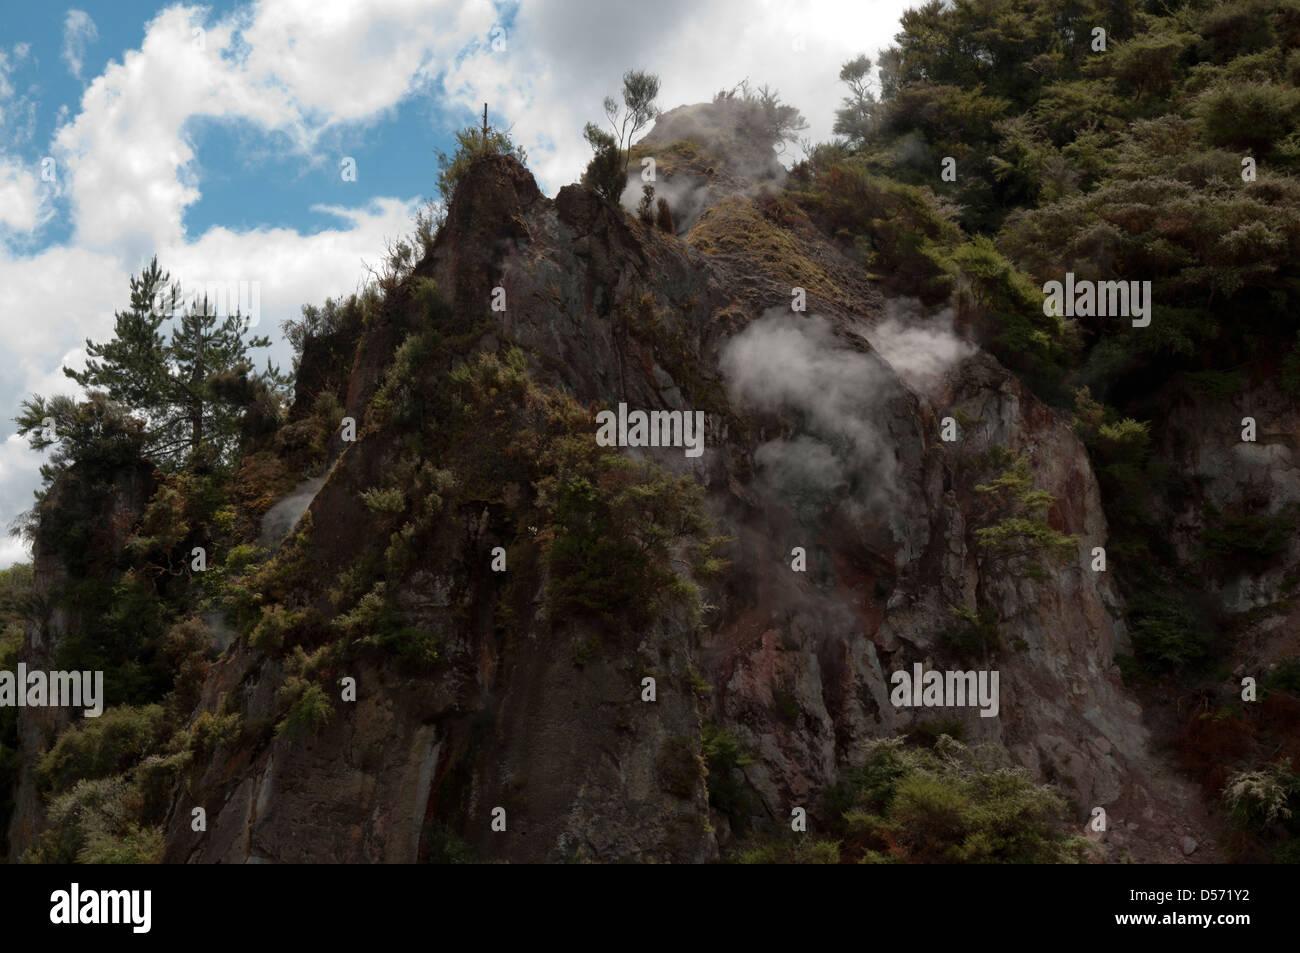 Erupting Mount Tarawera on New Zealand's North Island created at 10 June 1886 the 17 kilometers long Waimangu - Stock Image